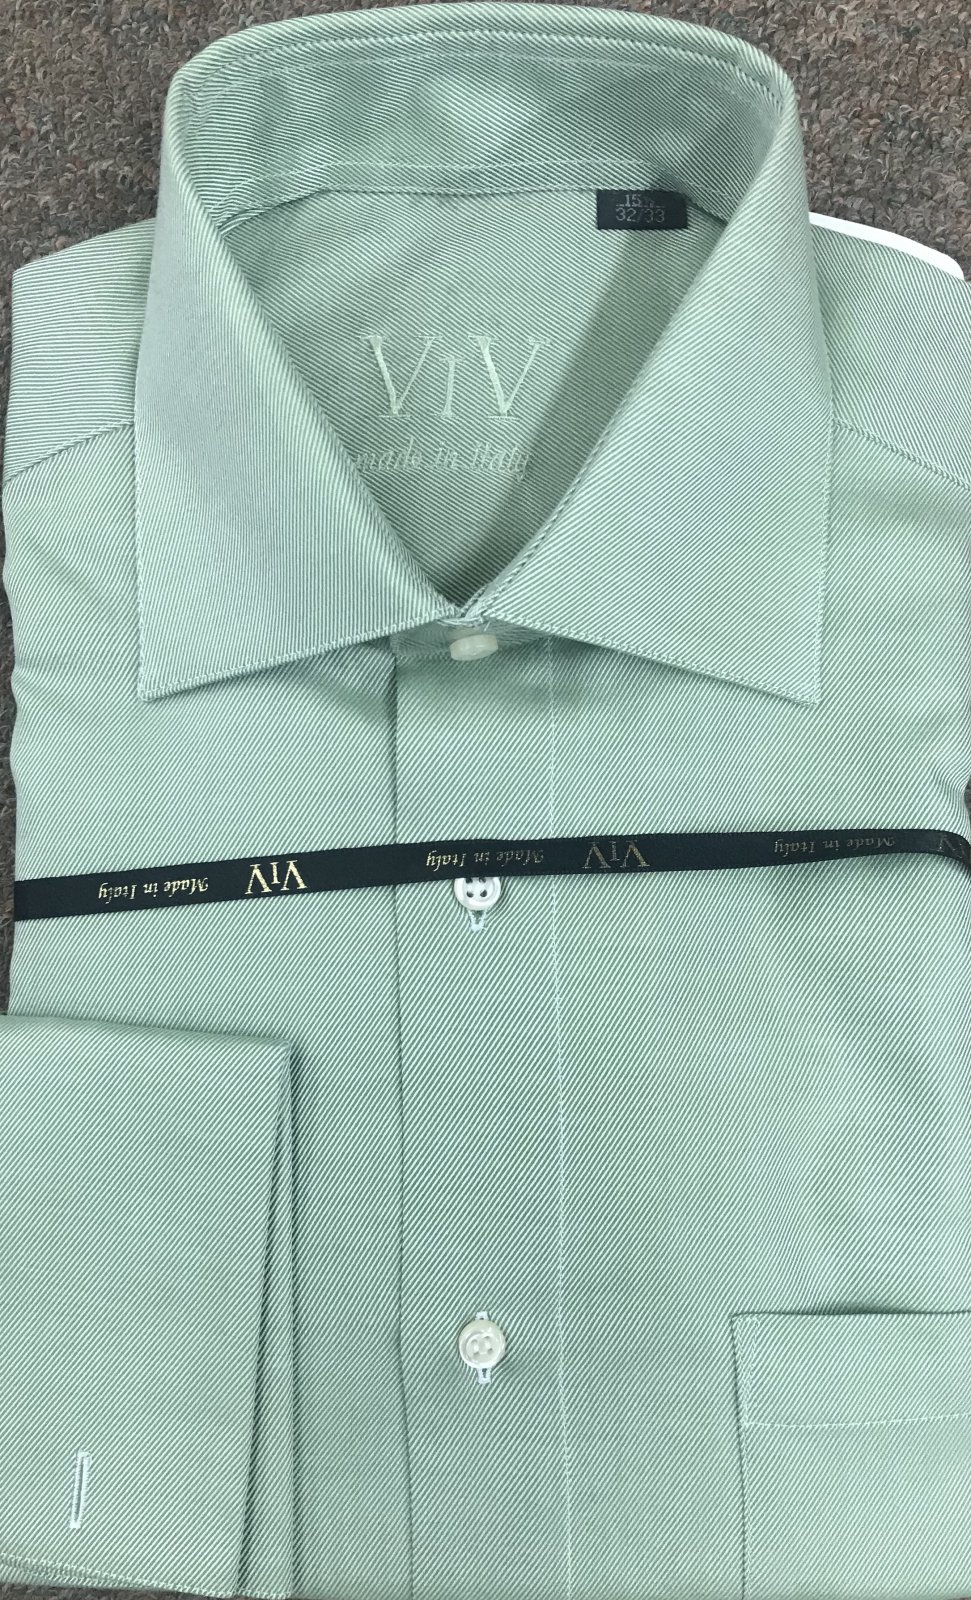 VIV French Cuff